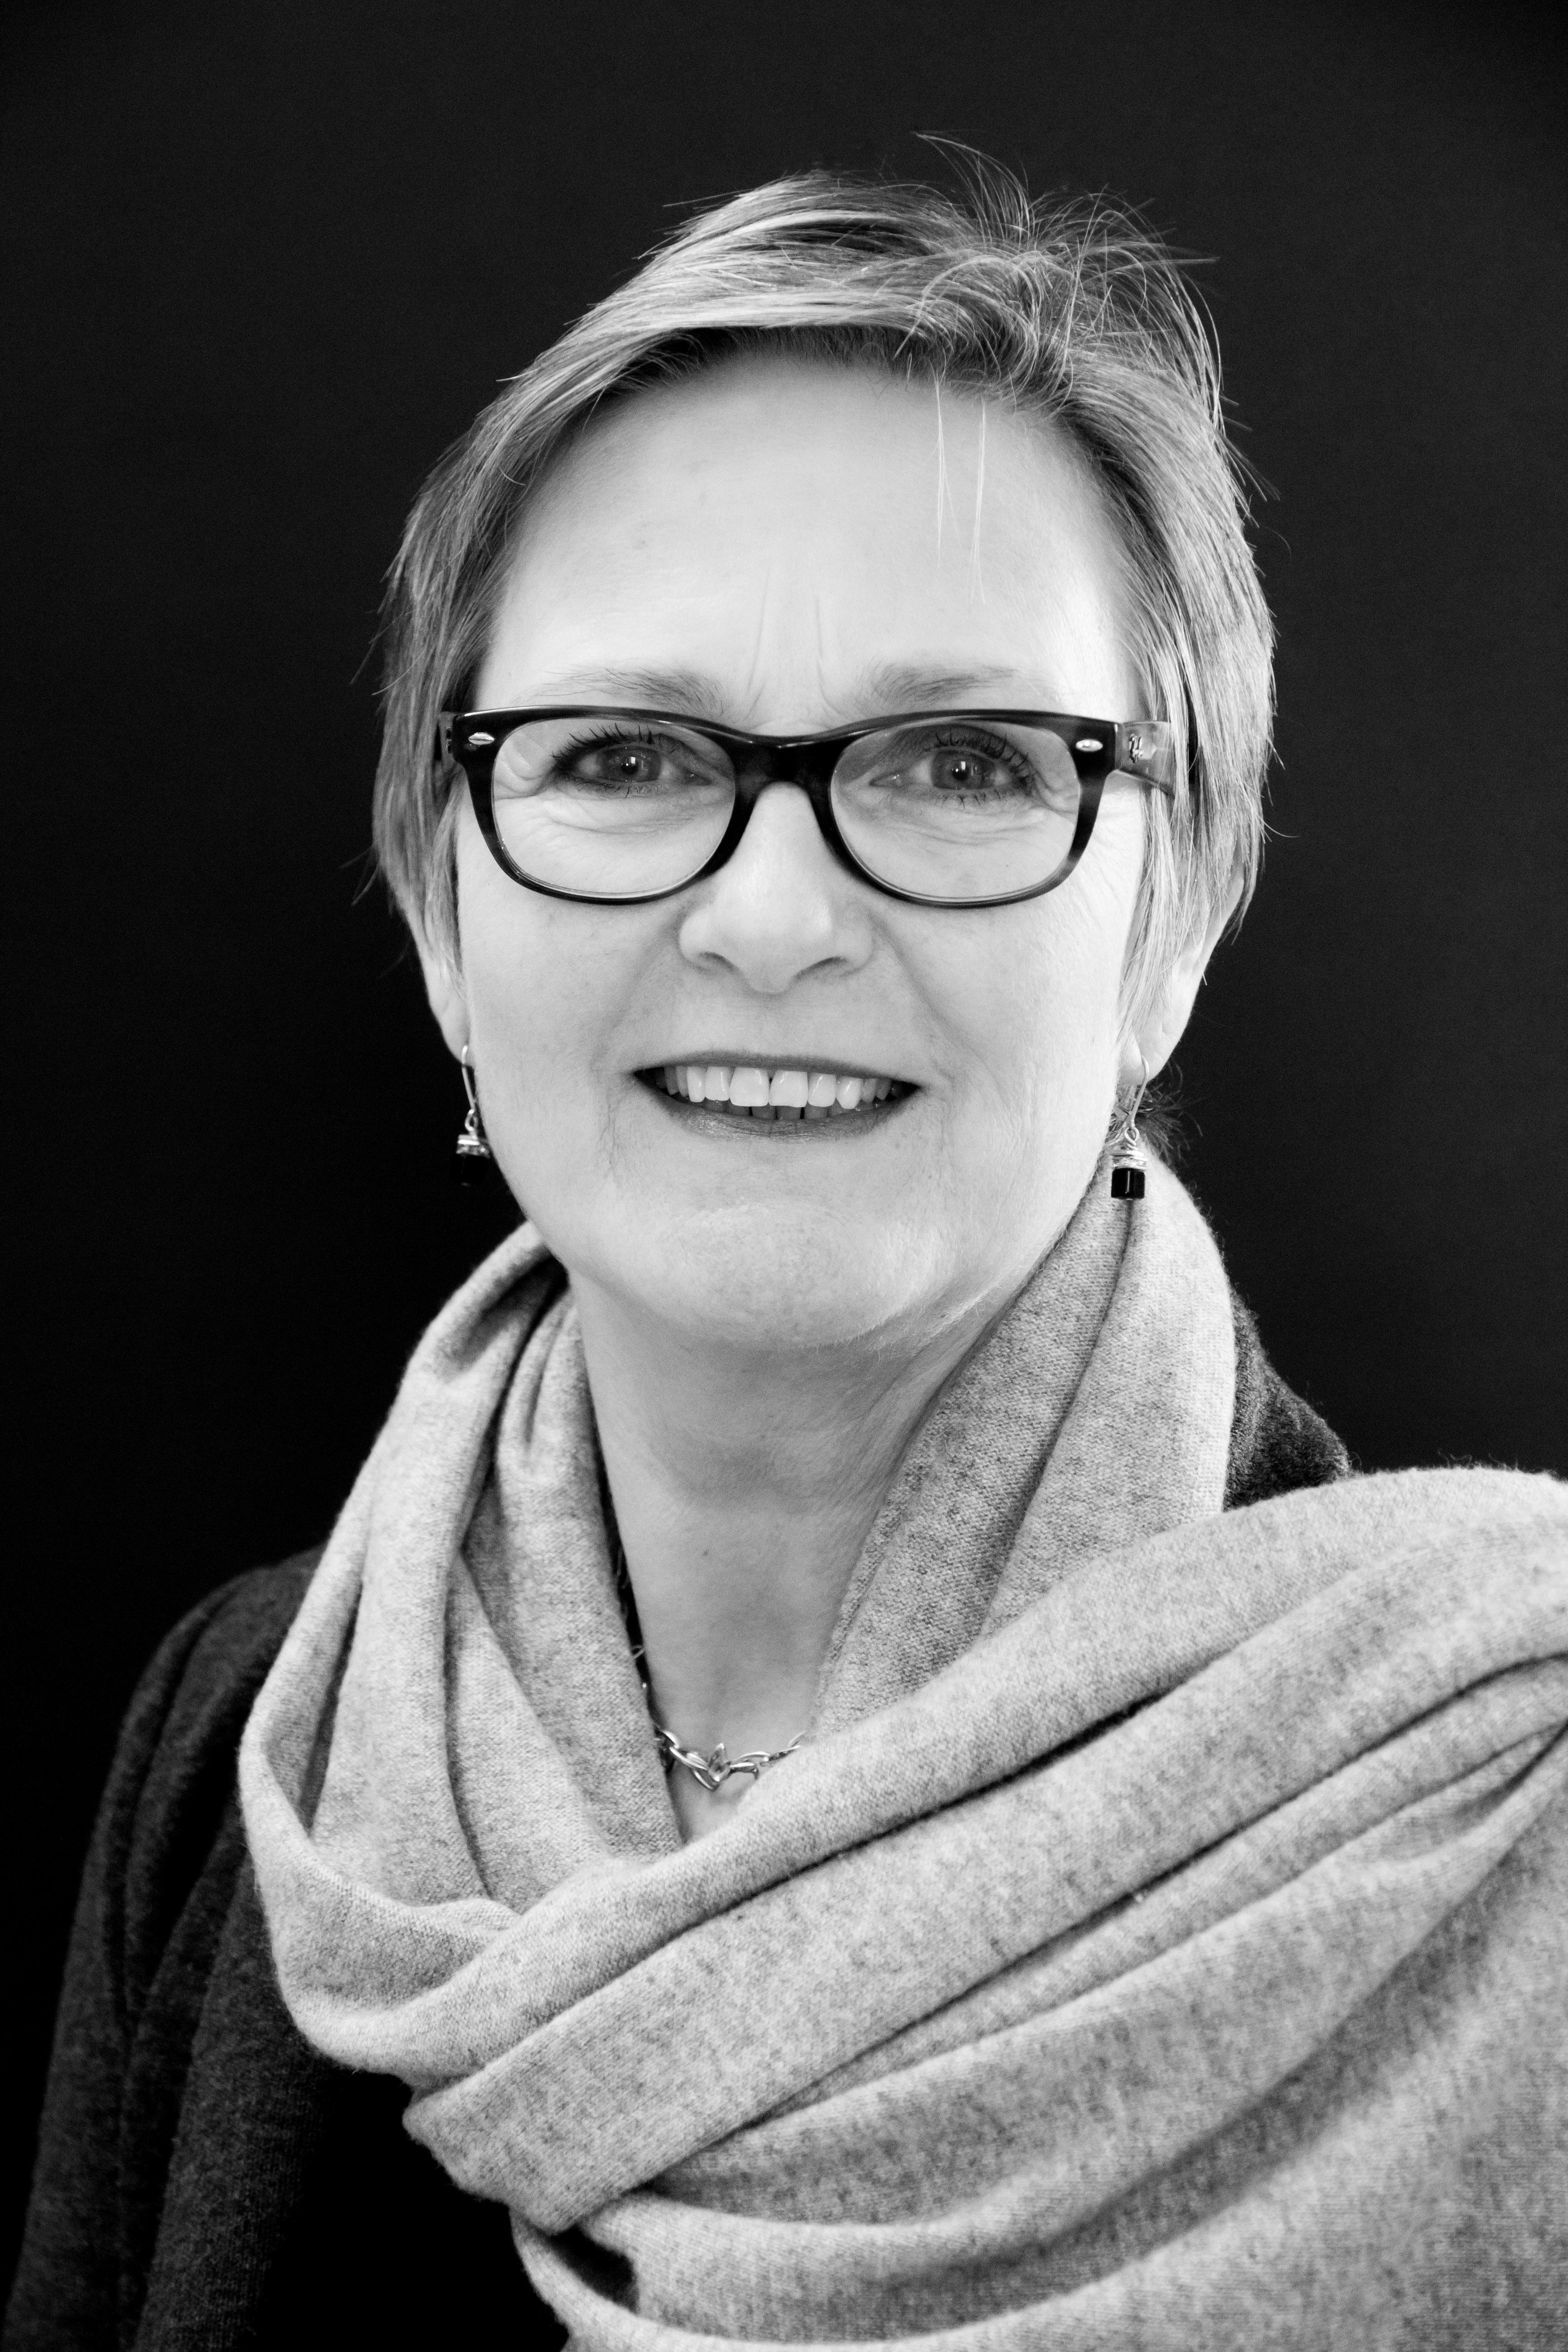 Birgit Smit - Verslaglegging4you